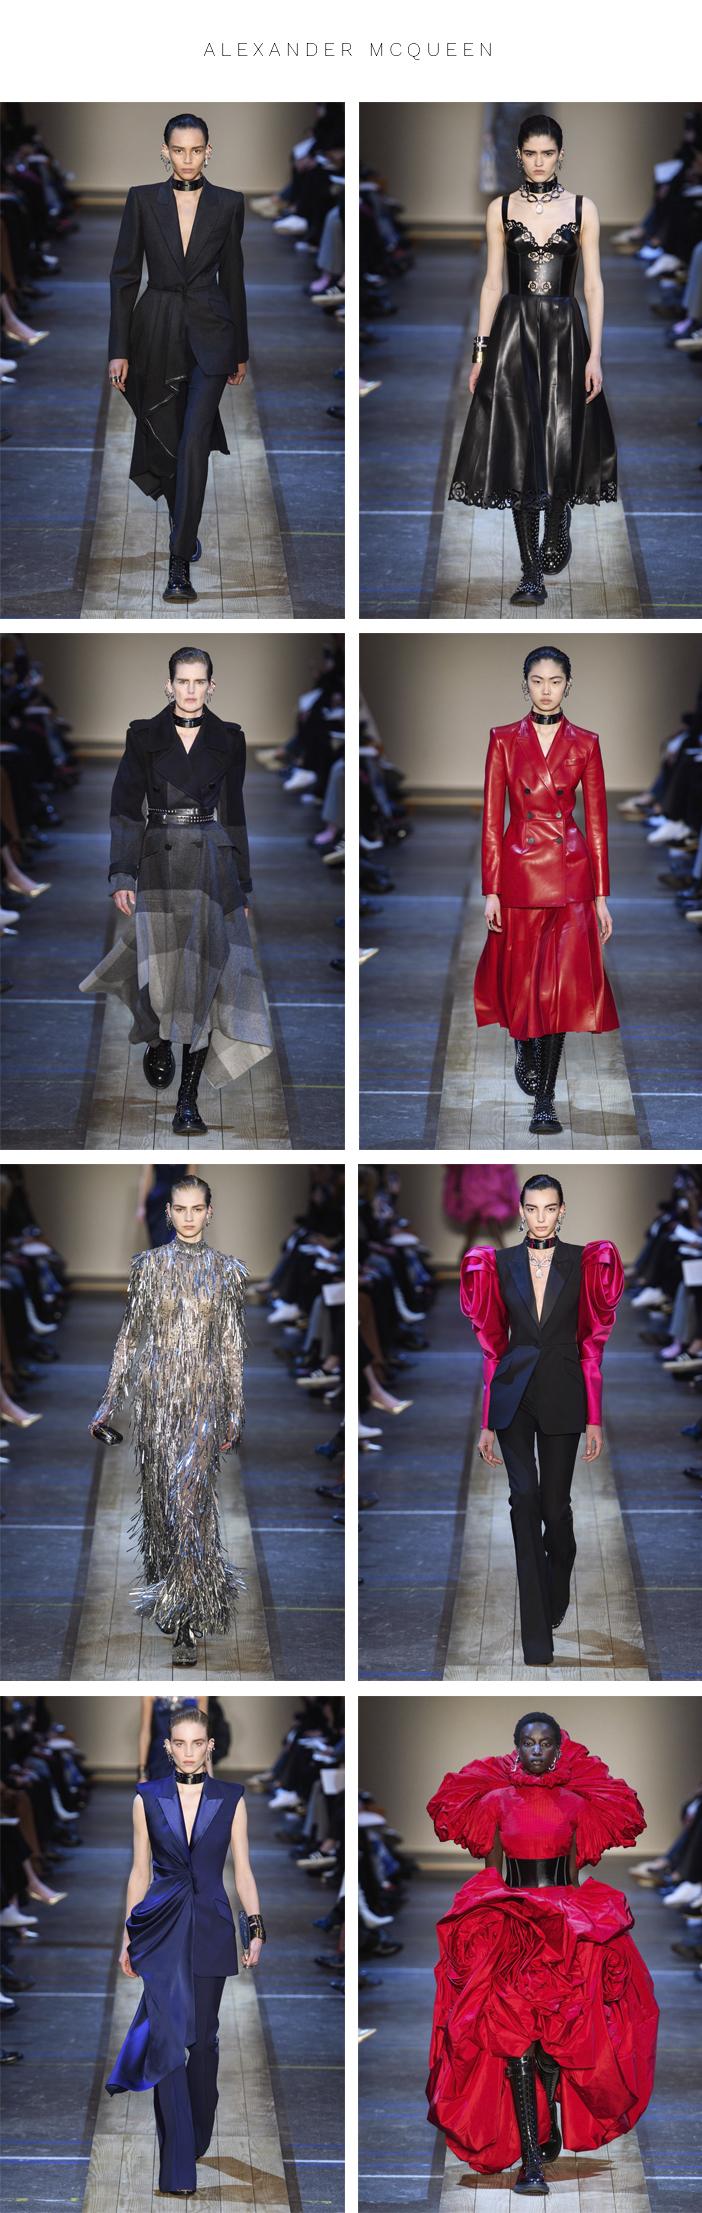 Semana de Moda de Paris - Inverno 2019 - Parte 3 - Alexander Mcqueen